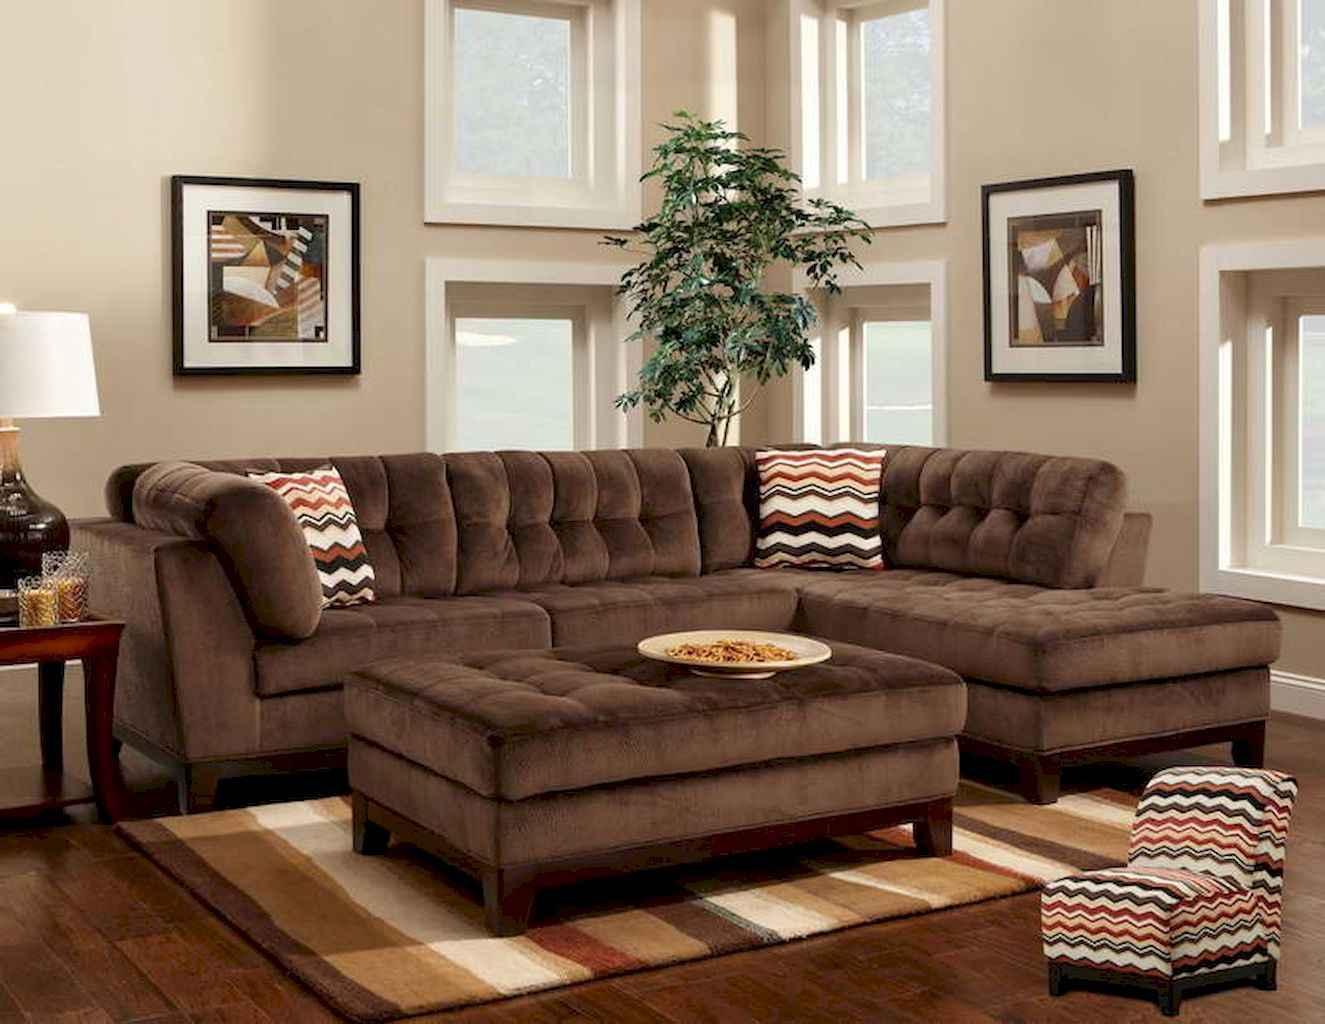 70 Rustic Farmhouse Living Room Decor Ideas (37)